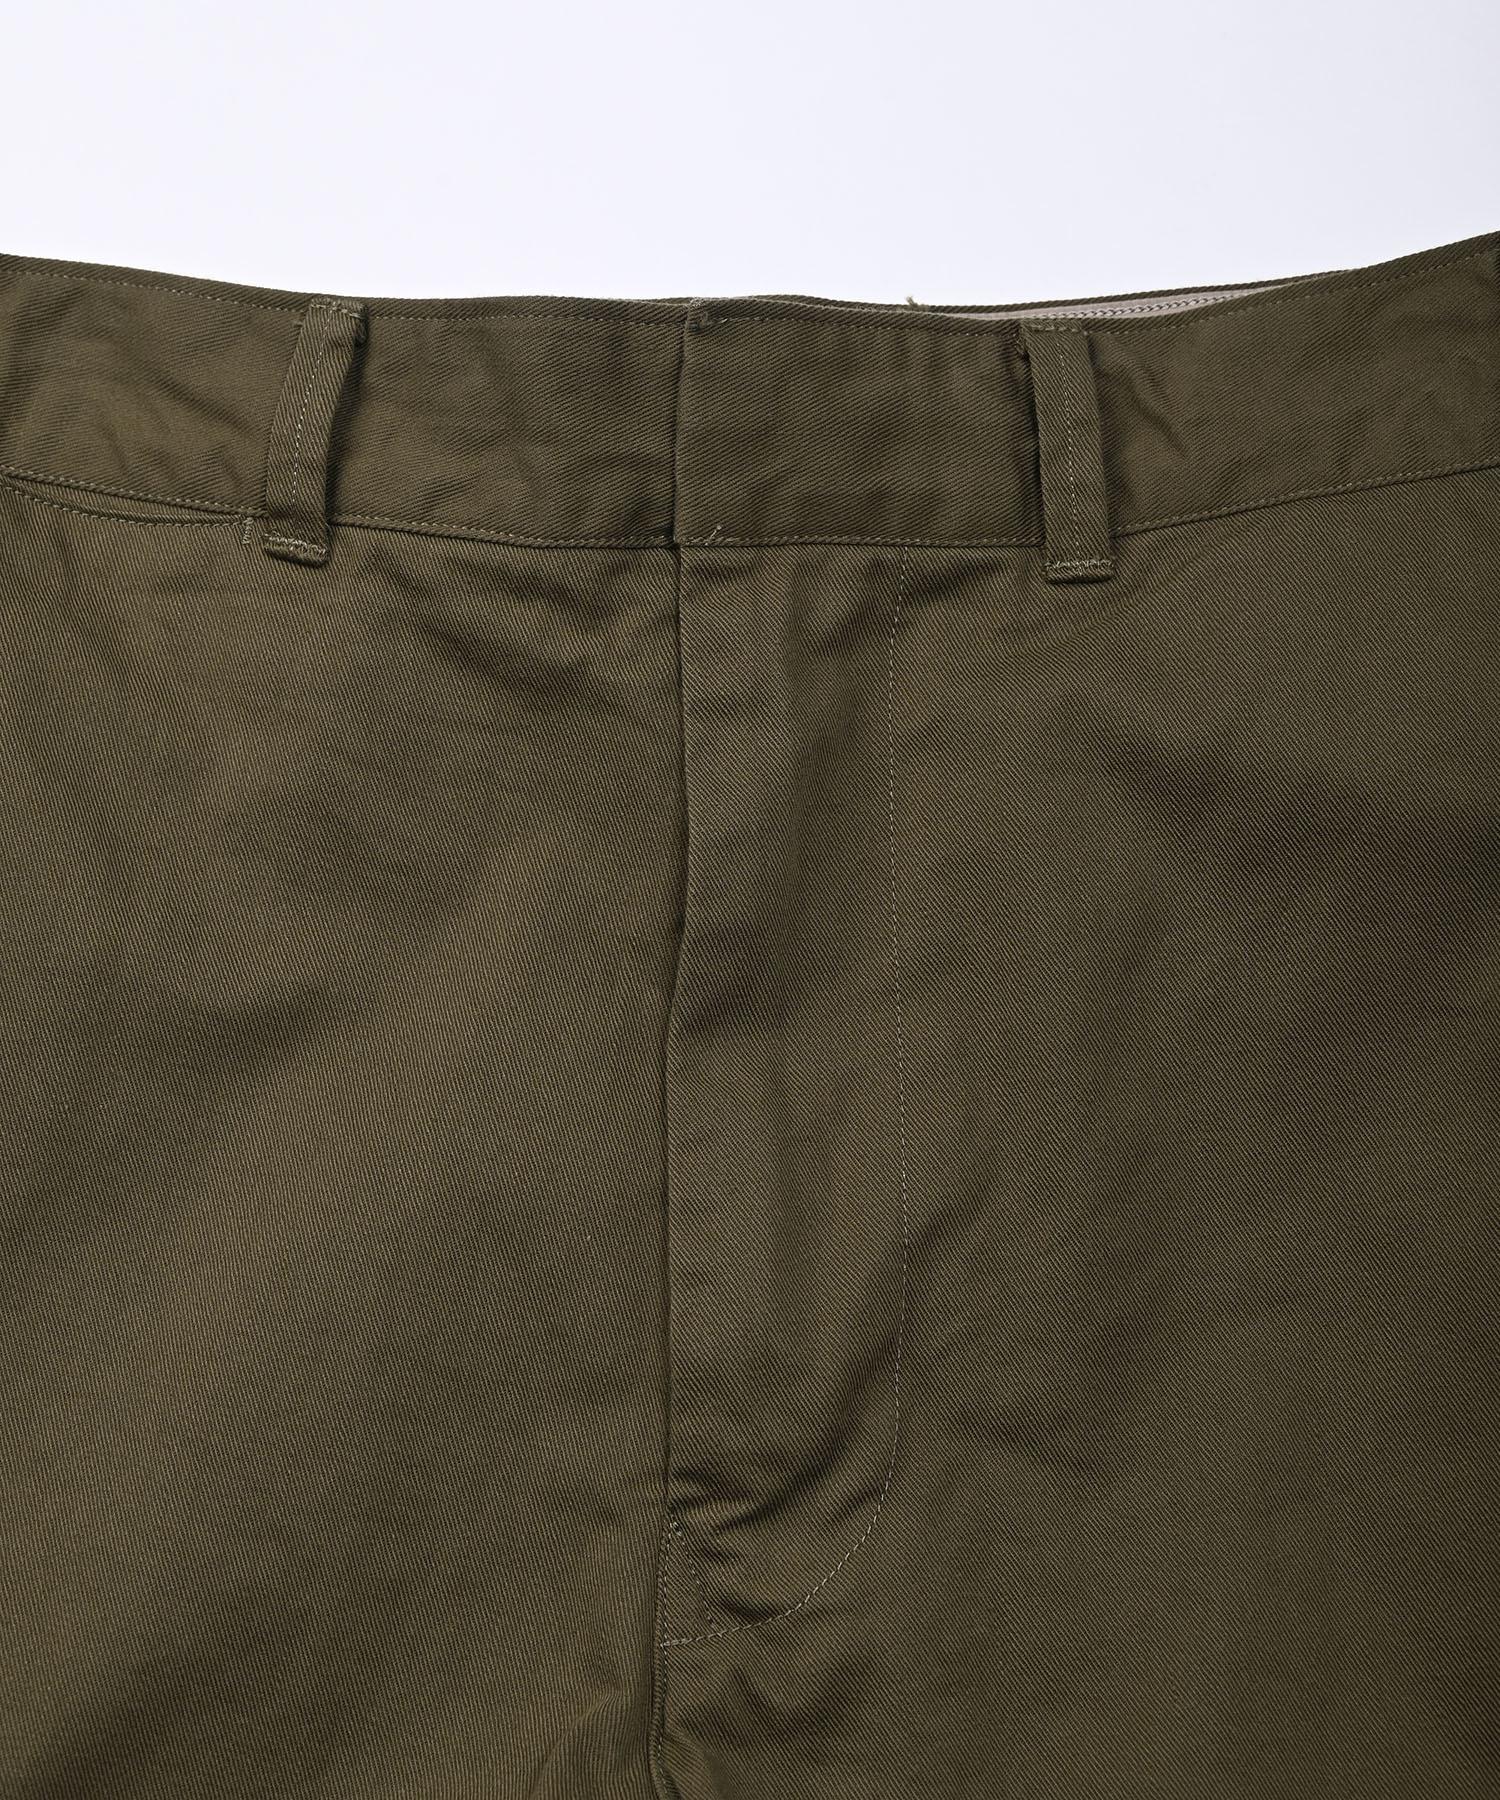 Okome Chino 908 Pants (0421)-8